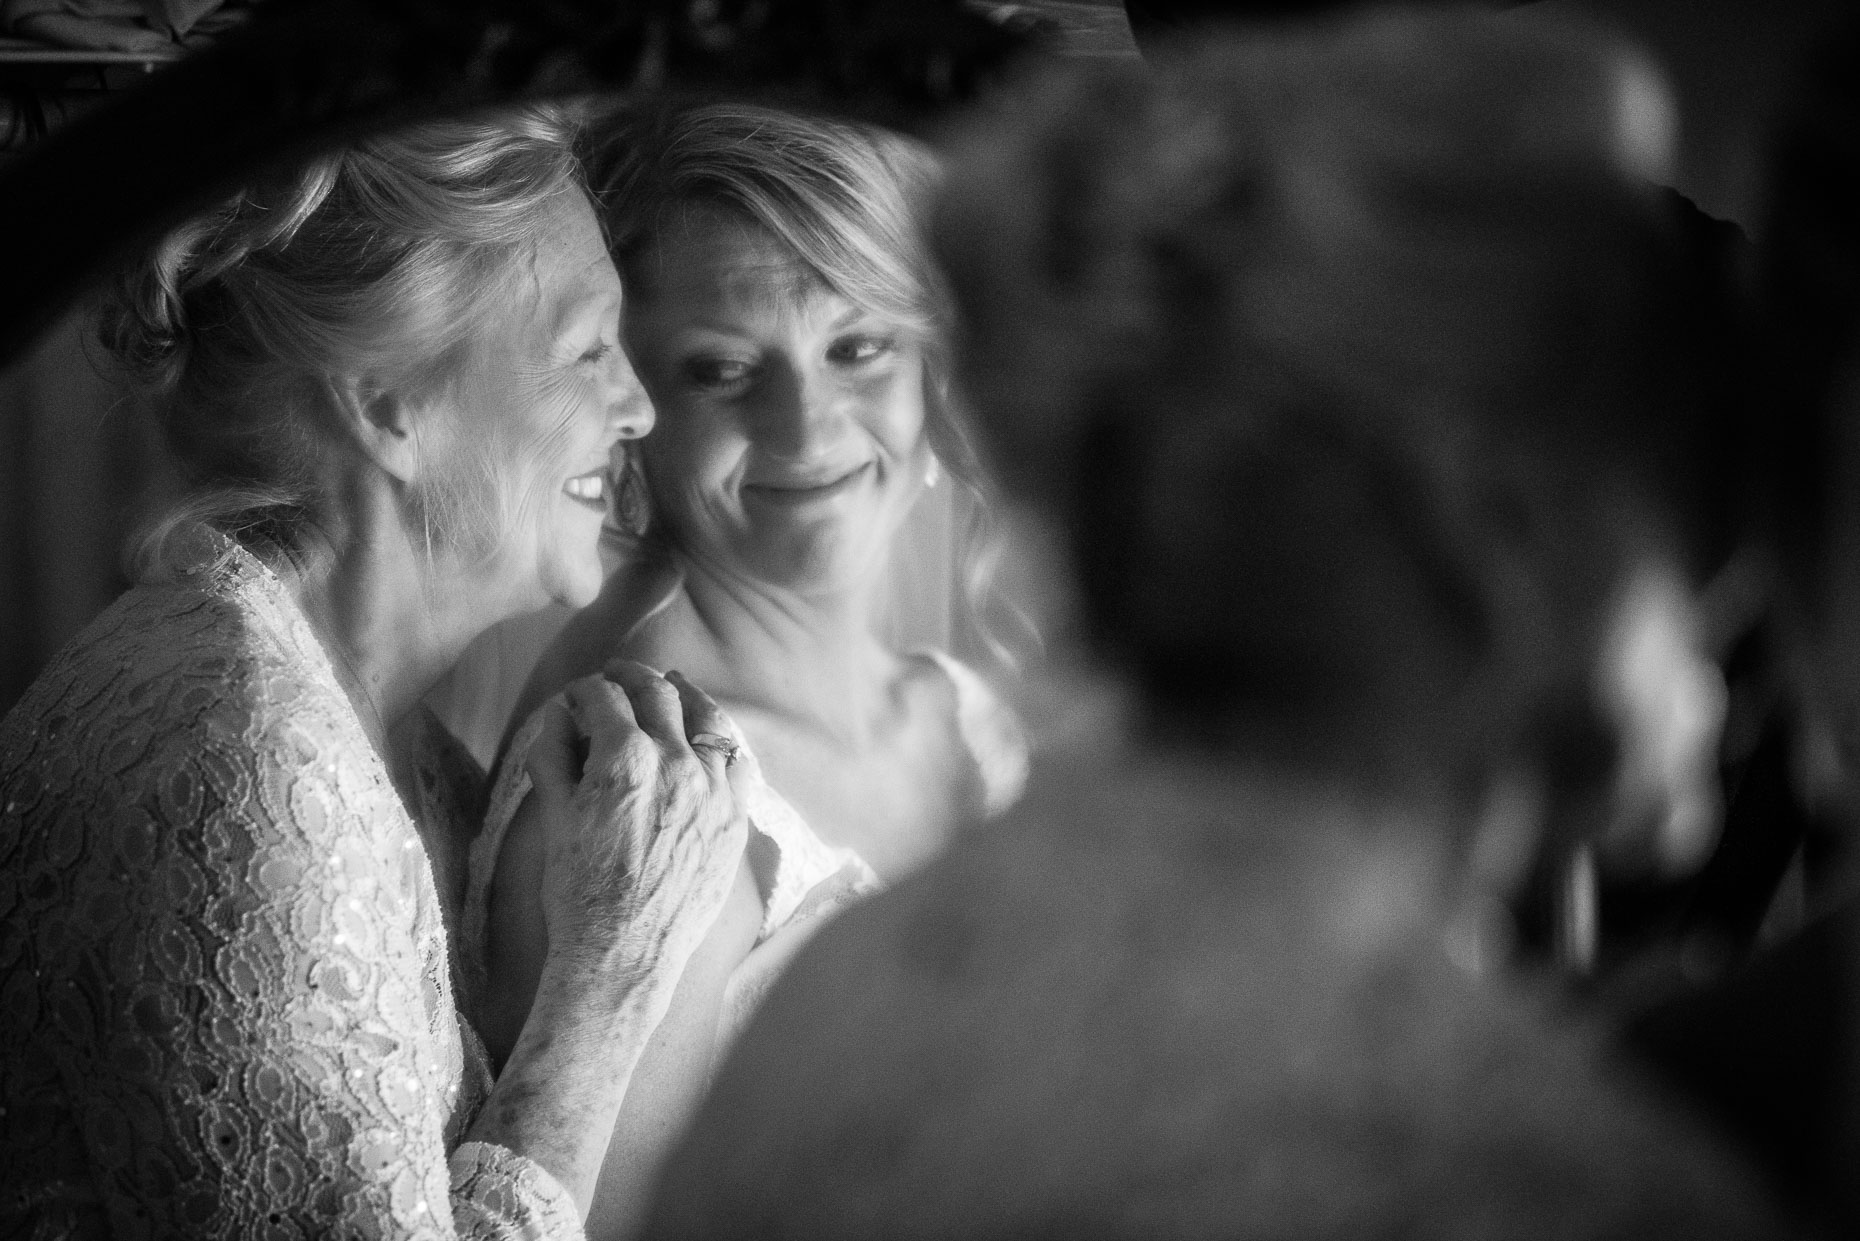 Weddings by Elliott O'Donovan - Washington DC_-6.jpg